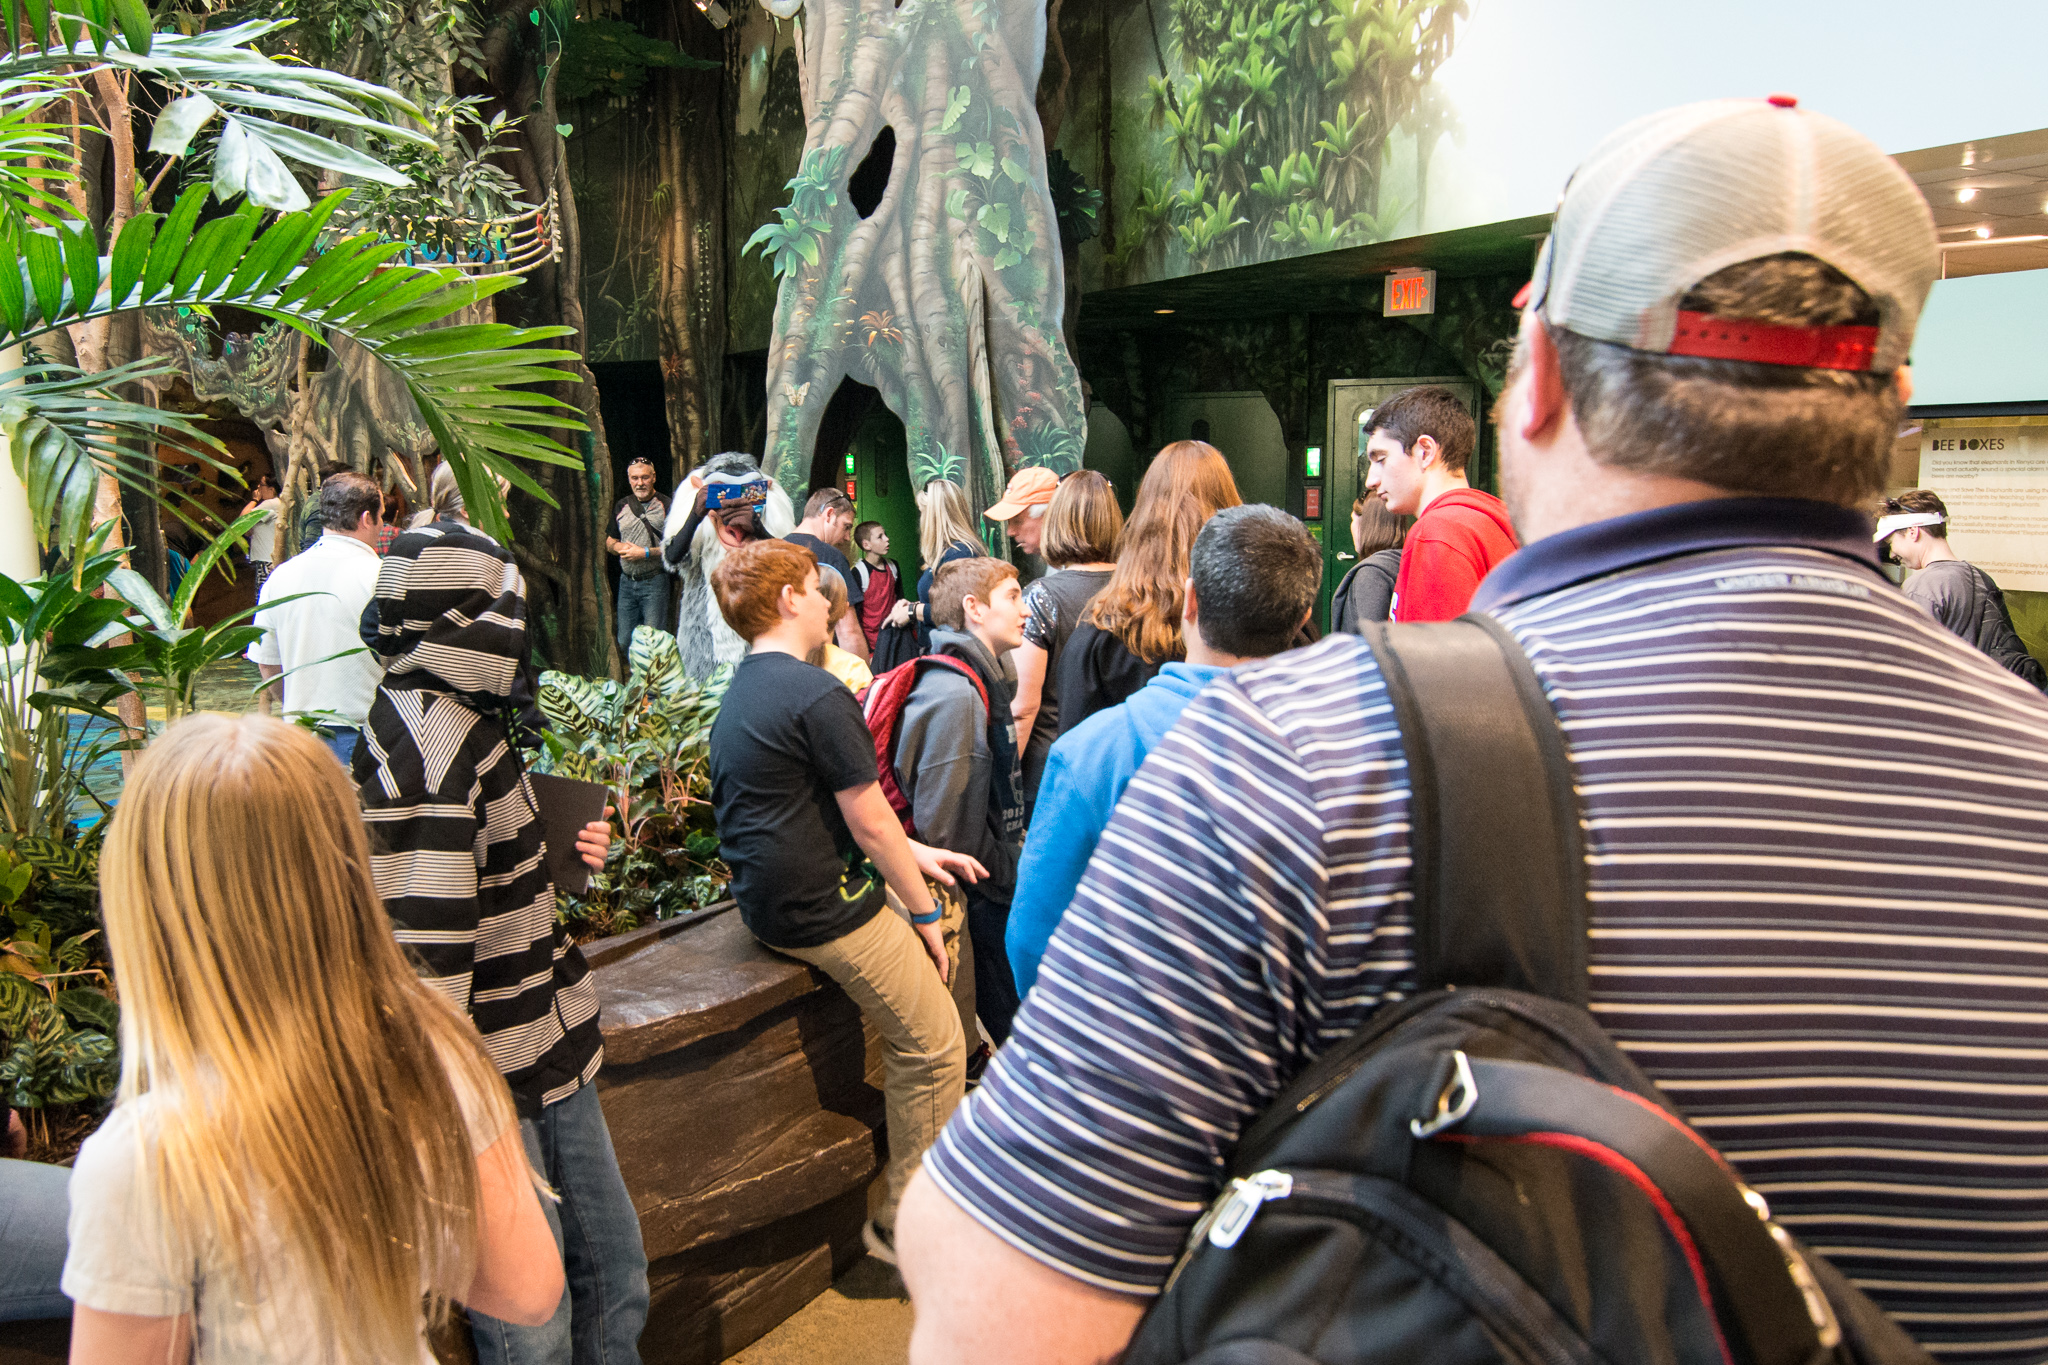 Rafiki Meet & Greet at Disney's Animal Kingdom